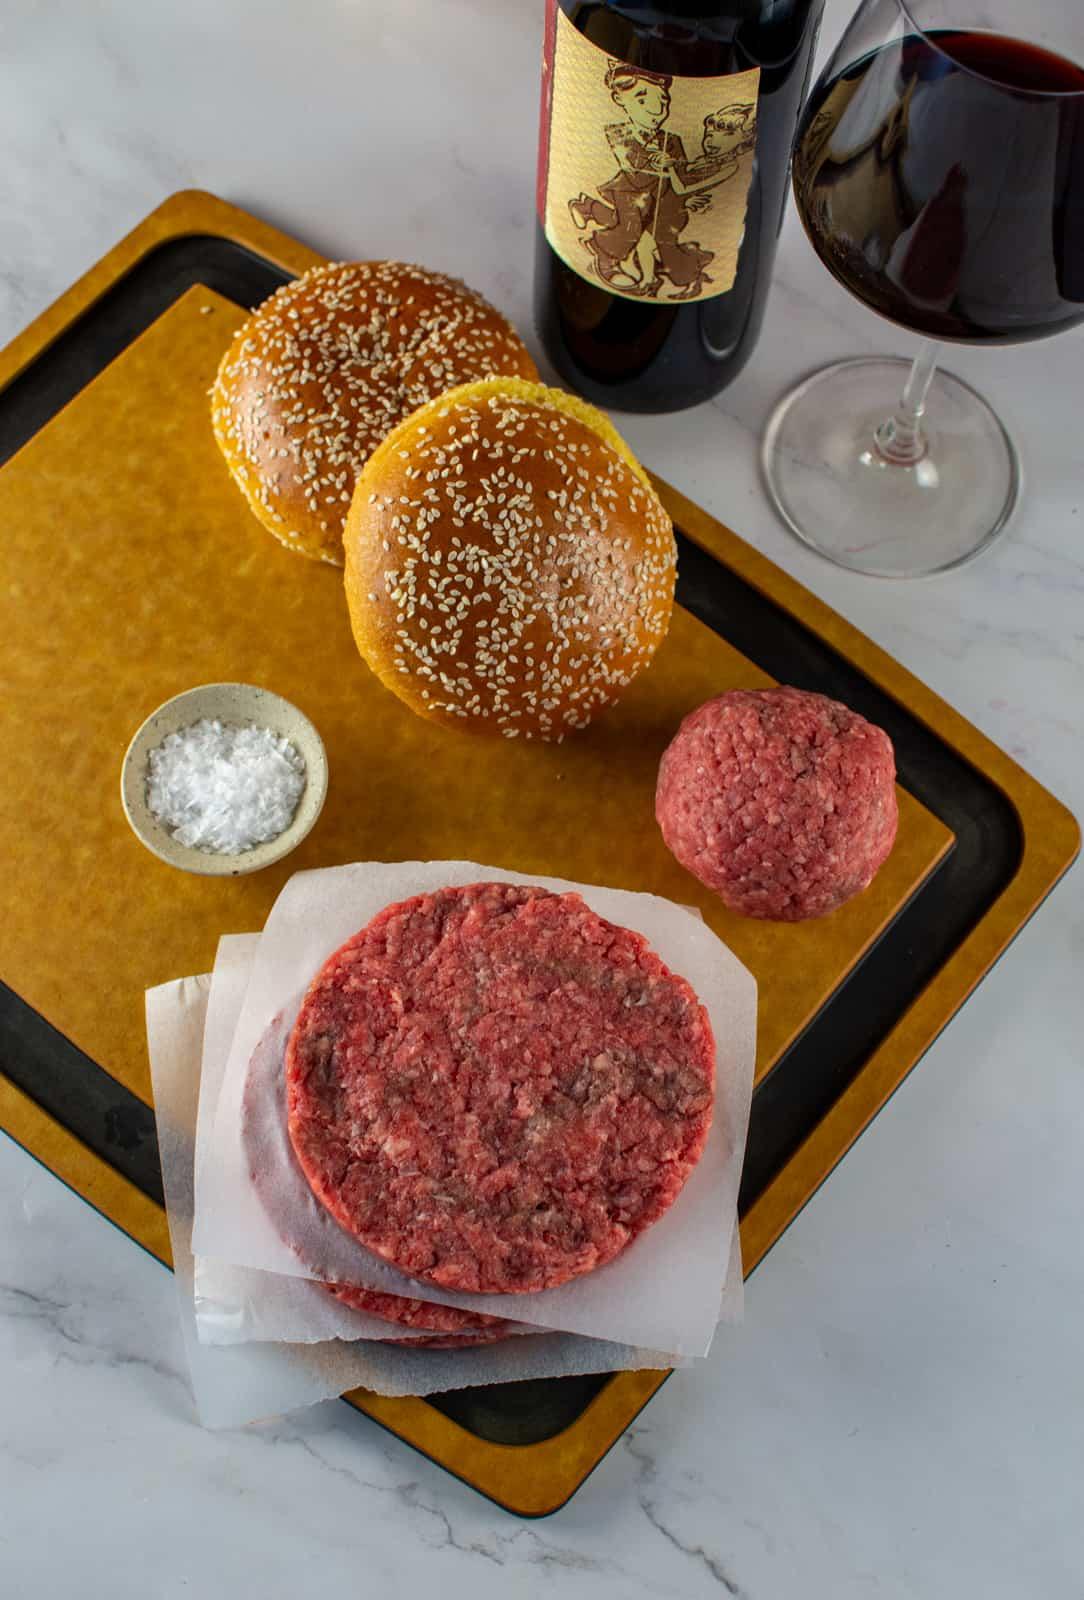 beef patties, salt, brioche buns on a chopping board with red wine beside it